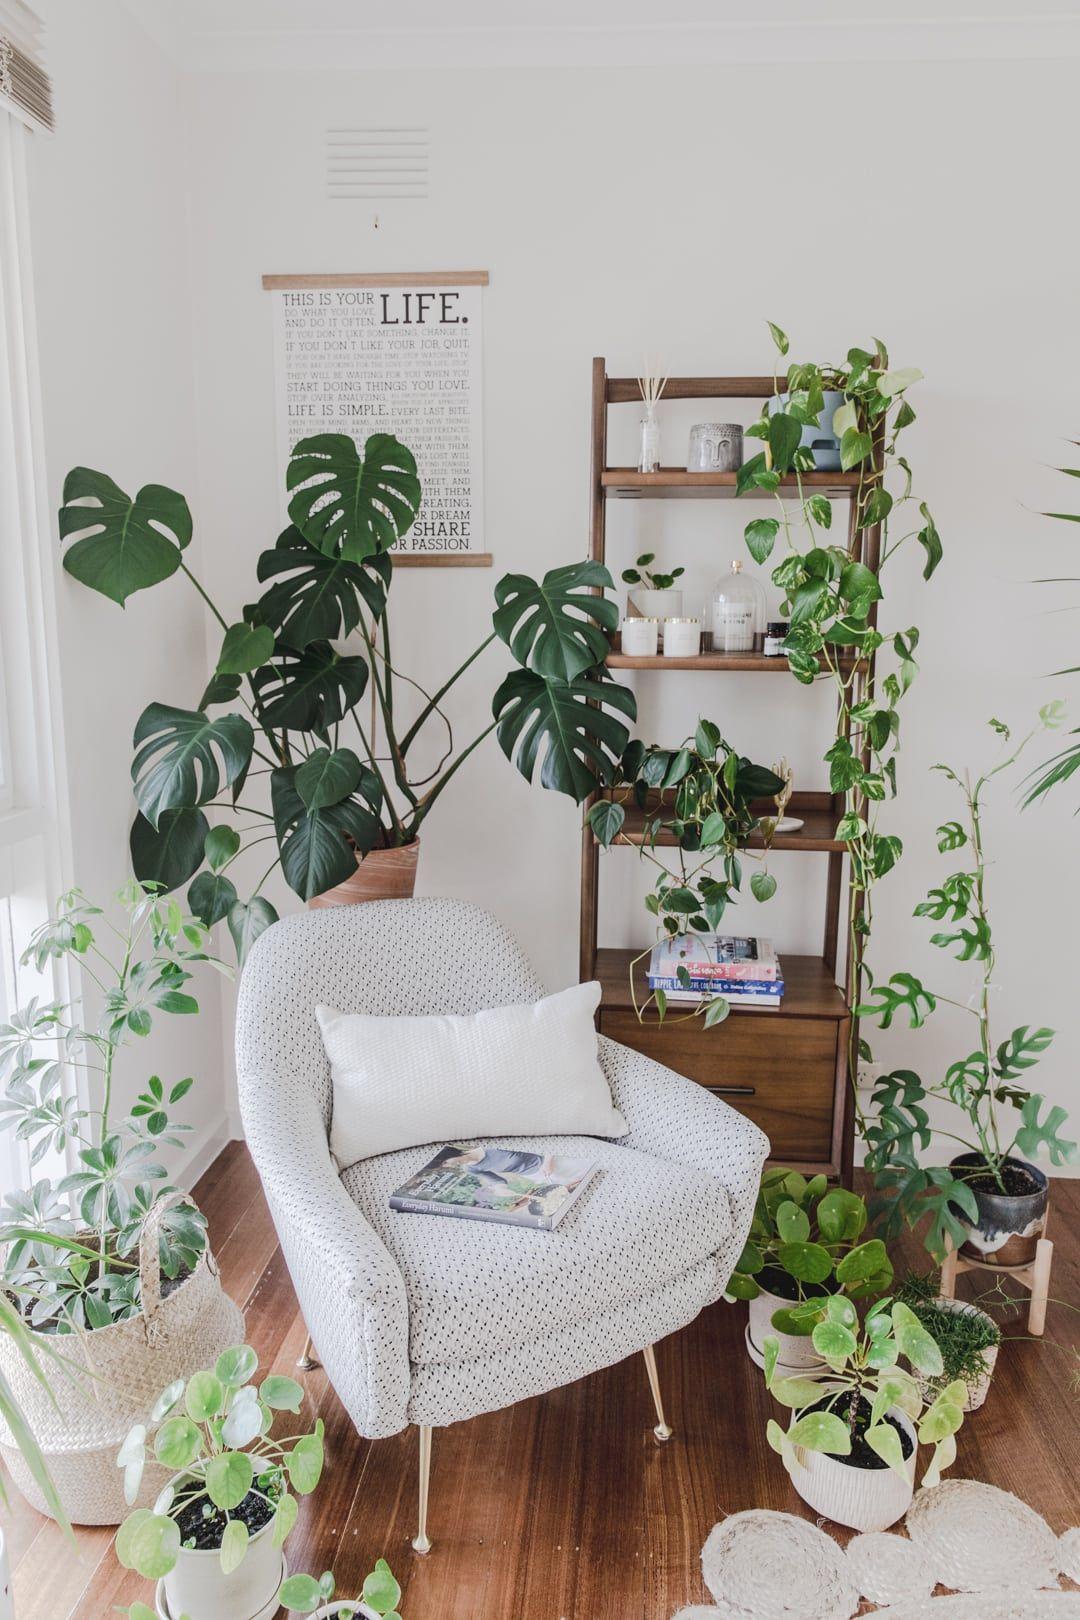 Our New Home Reading Corner Plant Corner Tour Connie And Luna Living Room Corner Corner Plant Living Room Plants #plants #for #living #room #corner